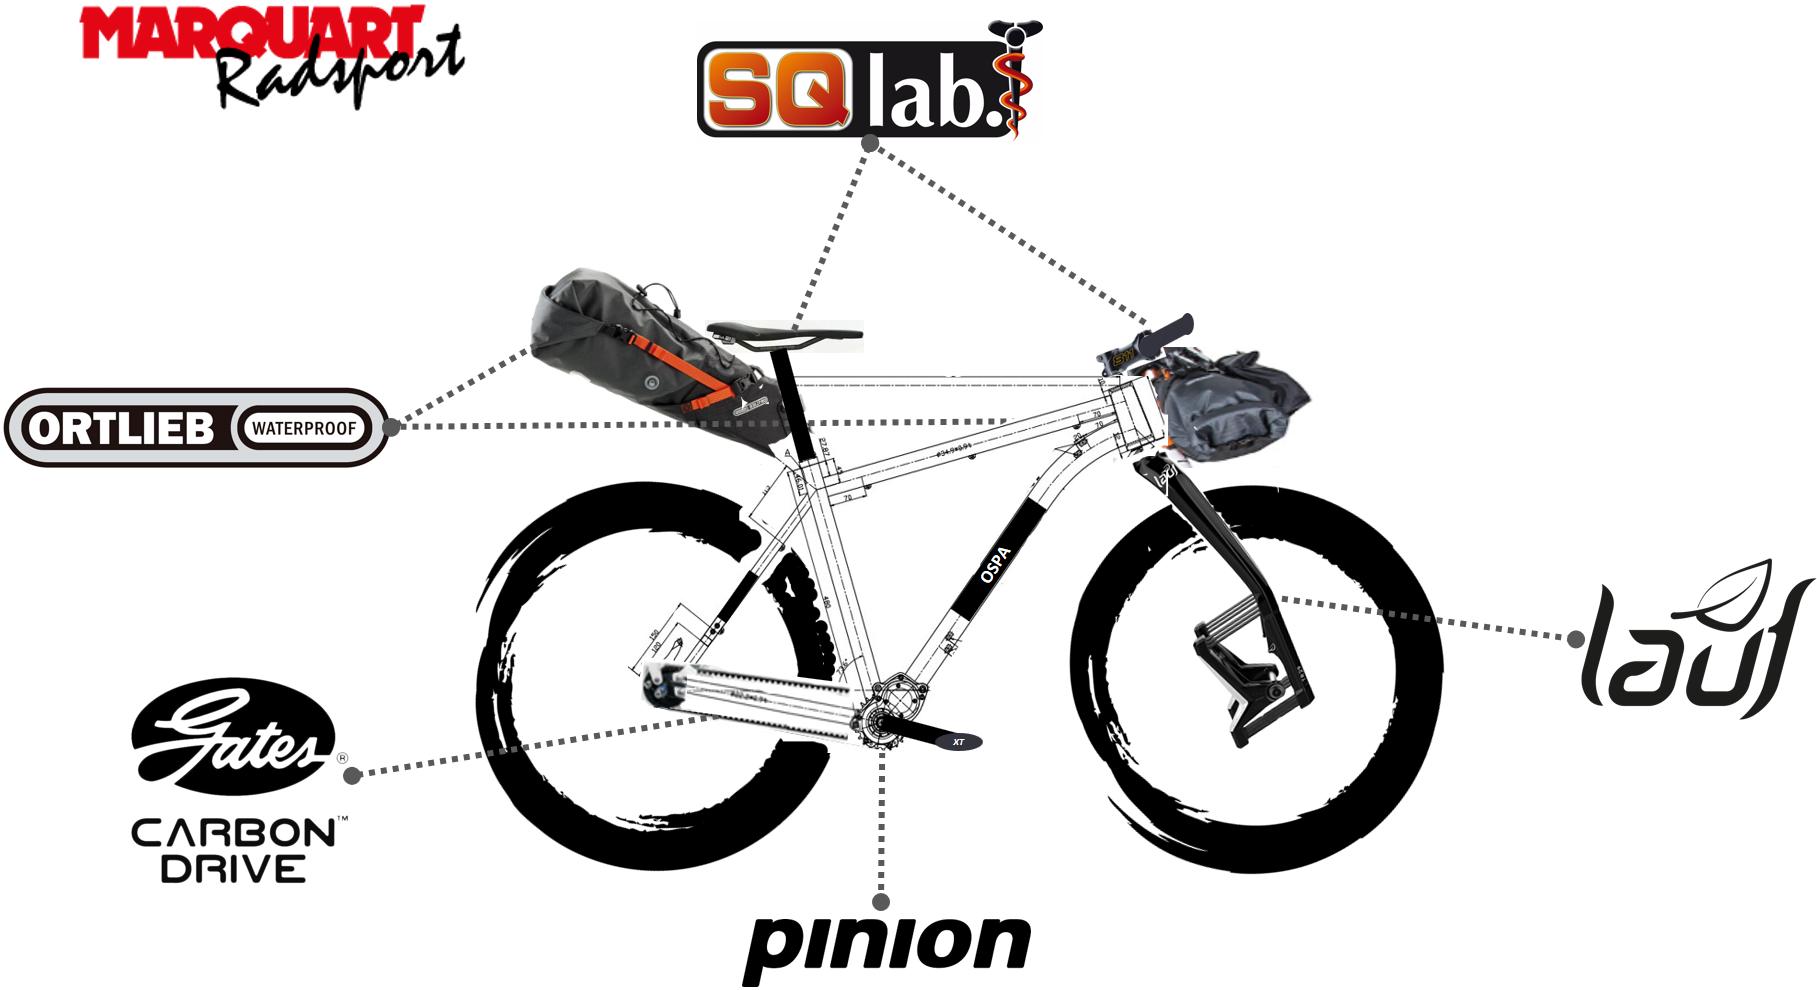 OSPA-Bike-Pinion-Lauf-SQLab-Gates-Ortlieb.png